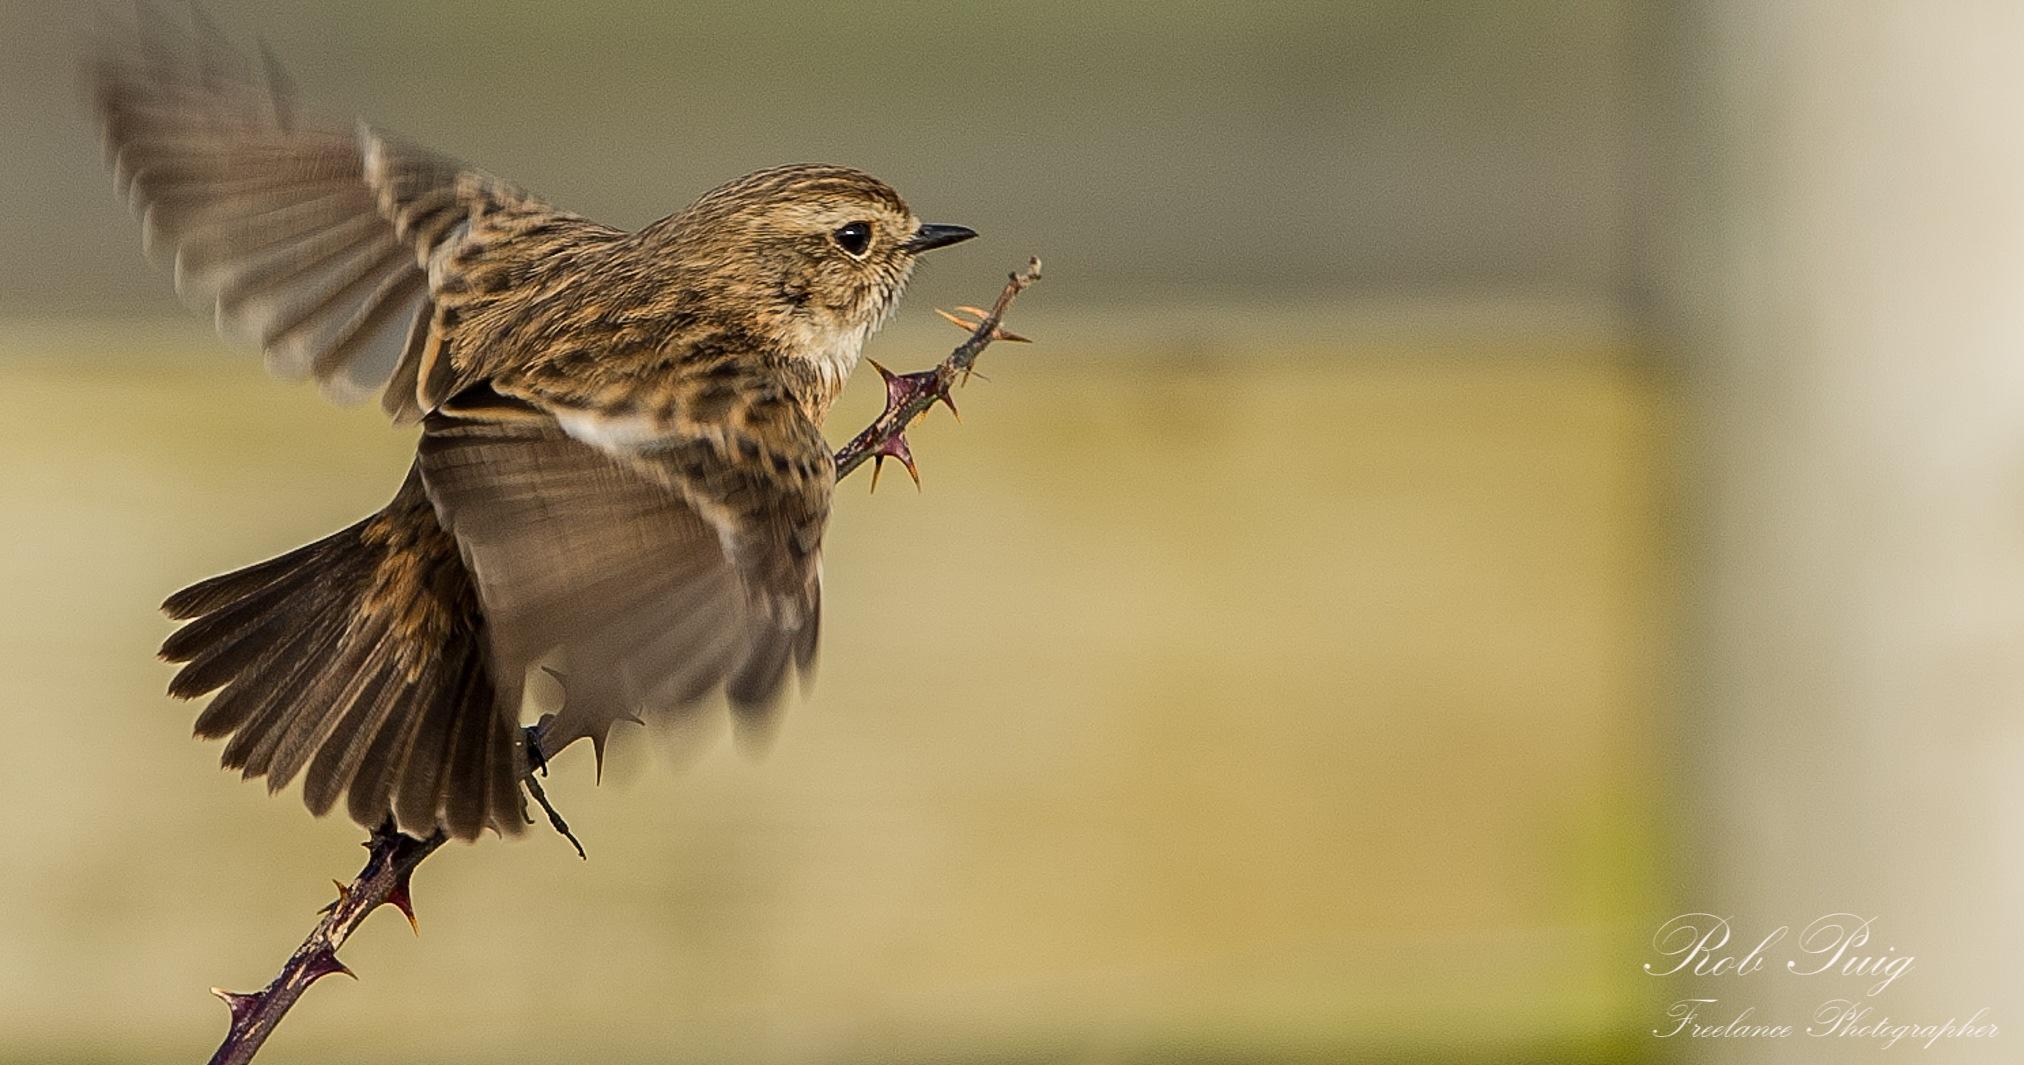 Take off by Robert Puig